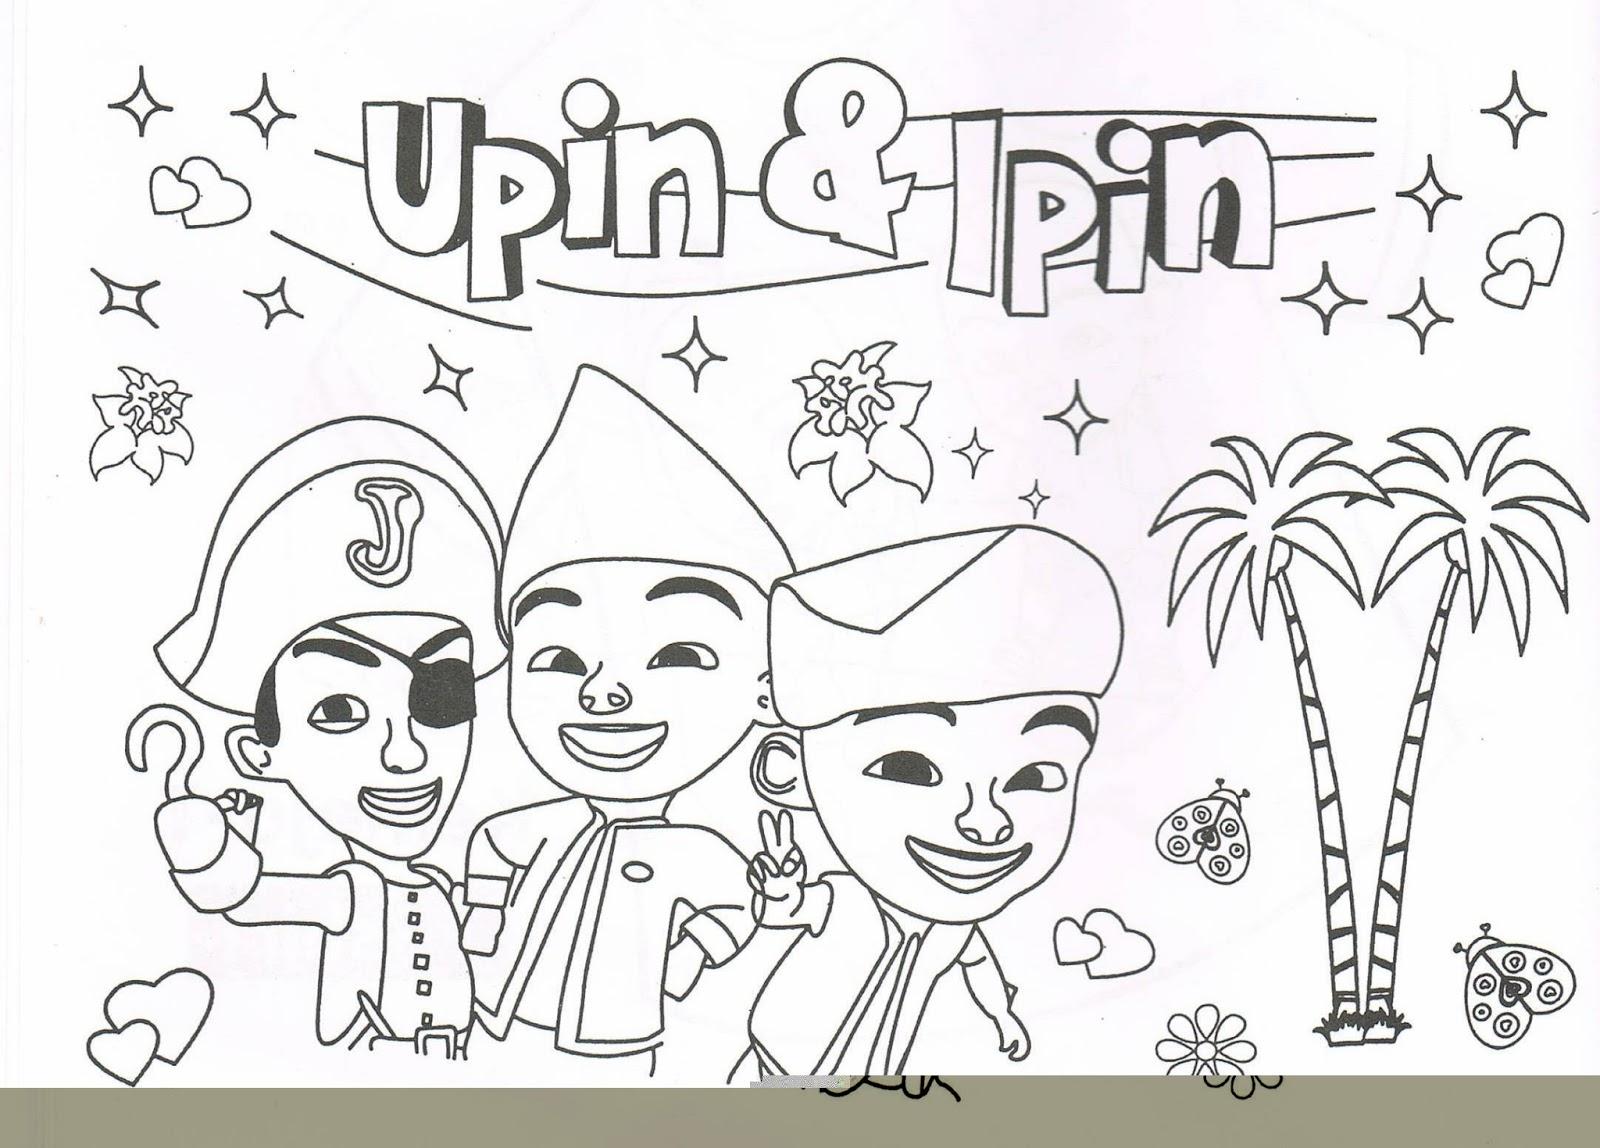 Gambar 10 Mewarnai Gambar Upin Ipin Terbaru Sketsa Kartun